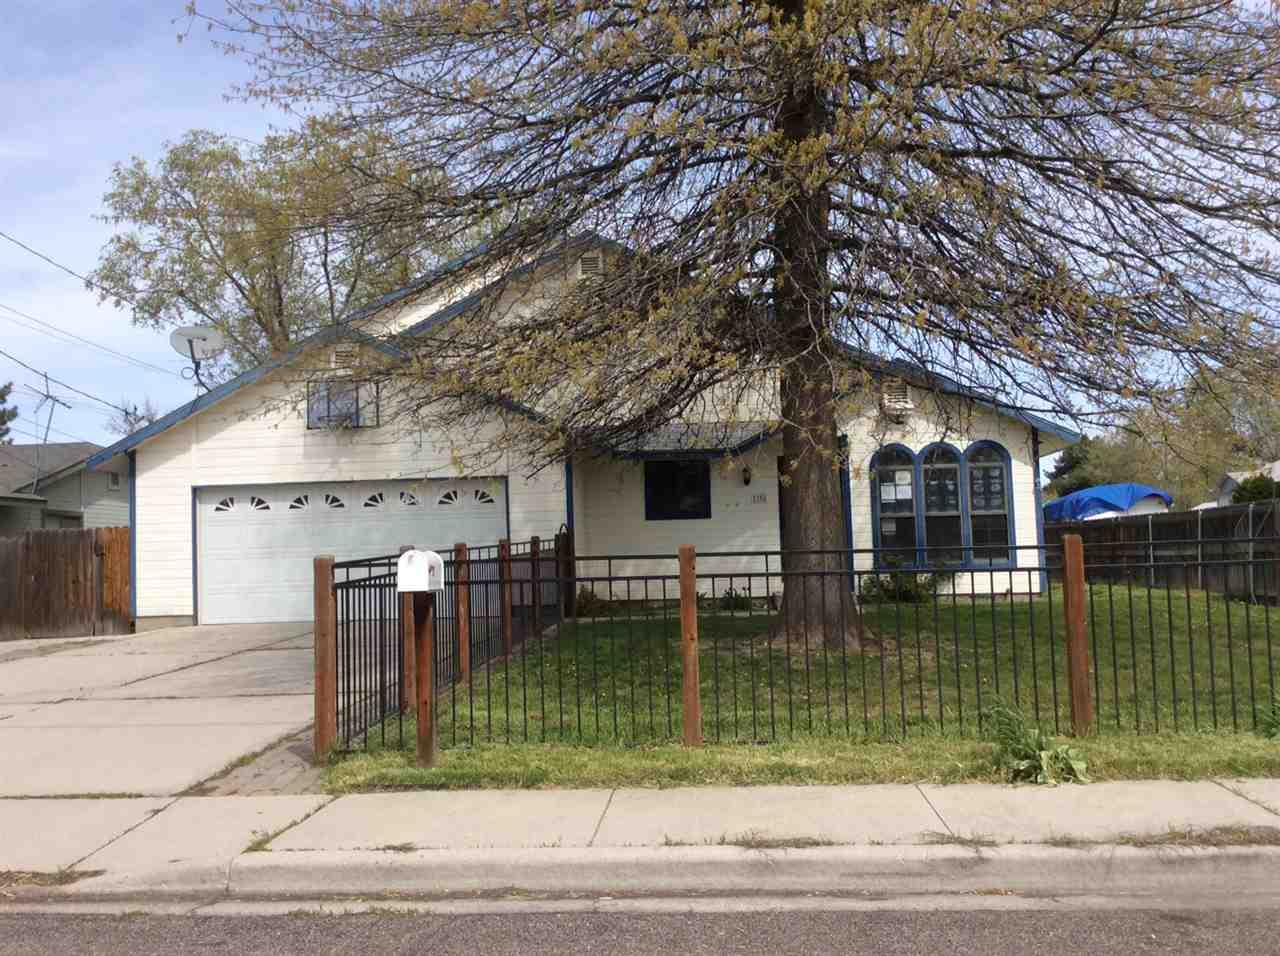 1300 W Targee St,Boise,Idaho 83706,5 Bedrooms Bedrooms,3 BathroomsBathrooms,Residential,1300 W Targee St,98674879